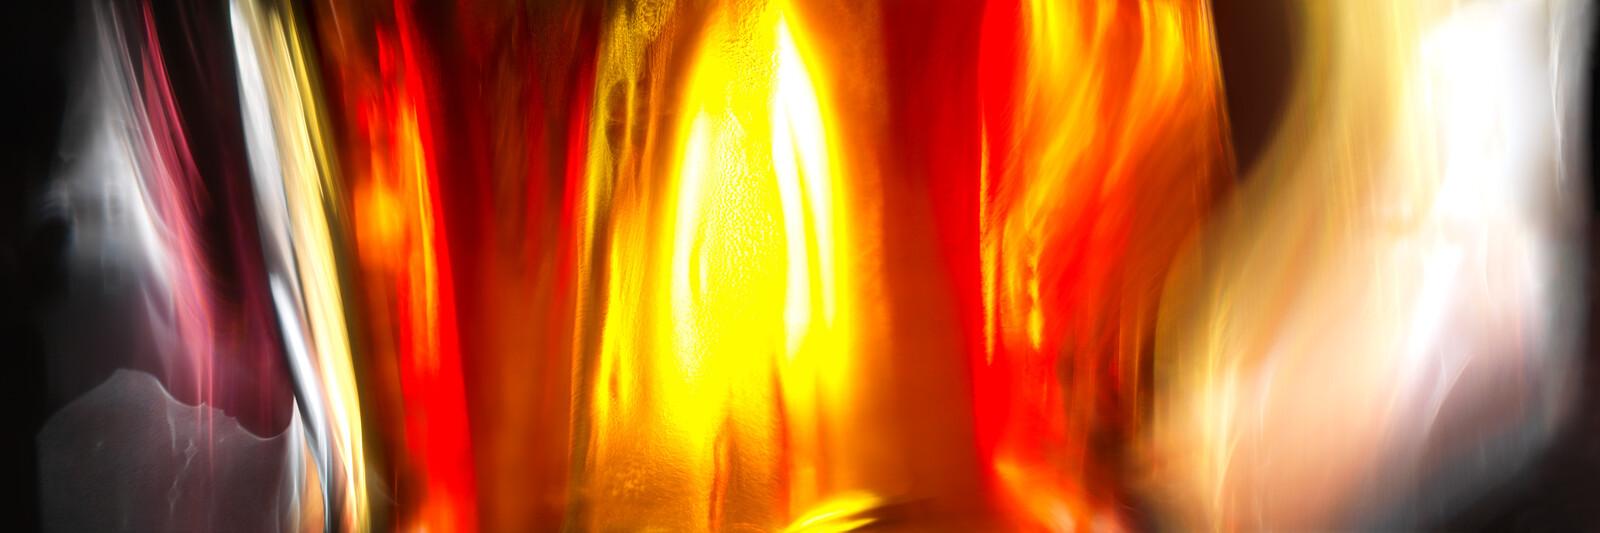 Fire - Beatrice Hug